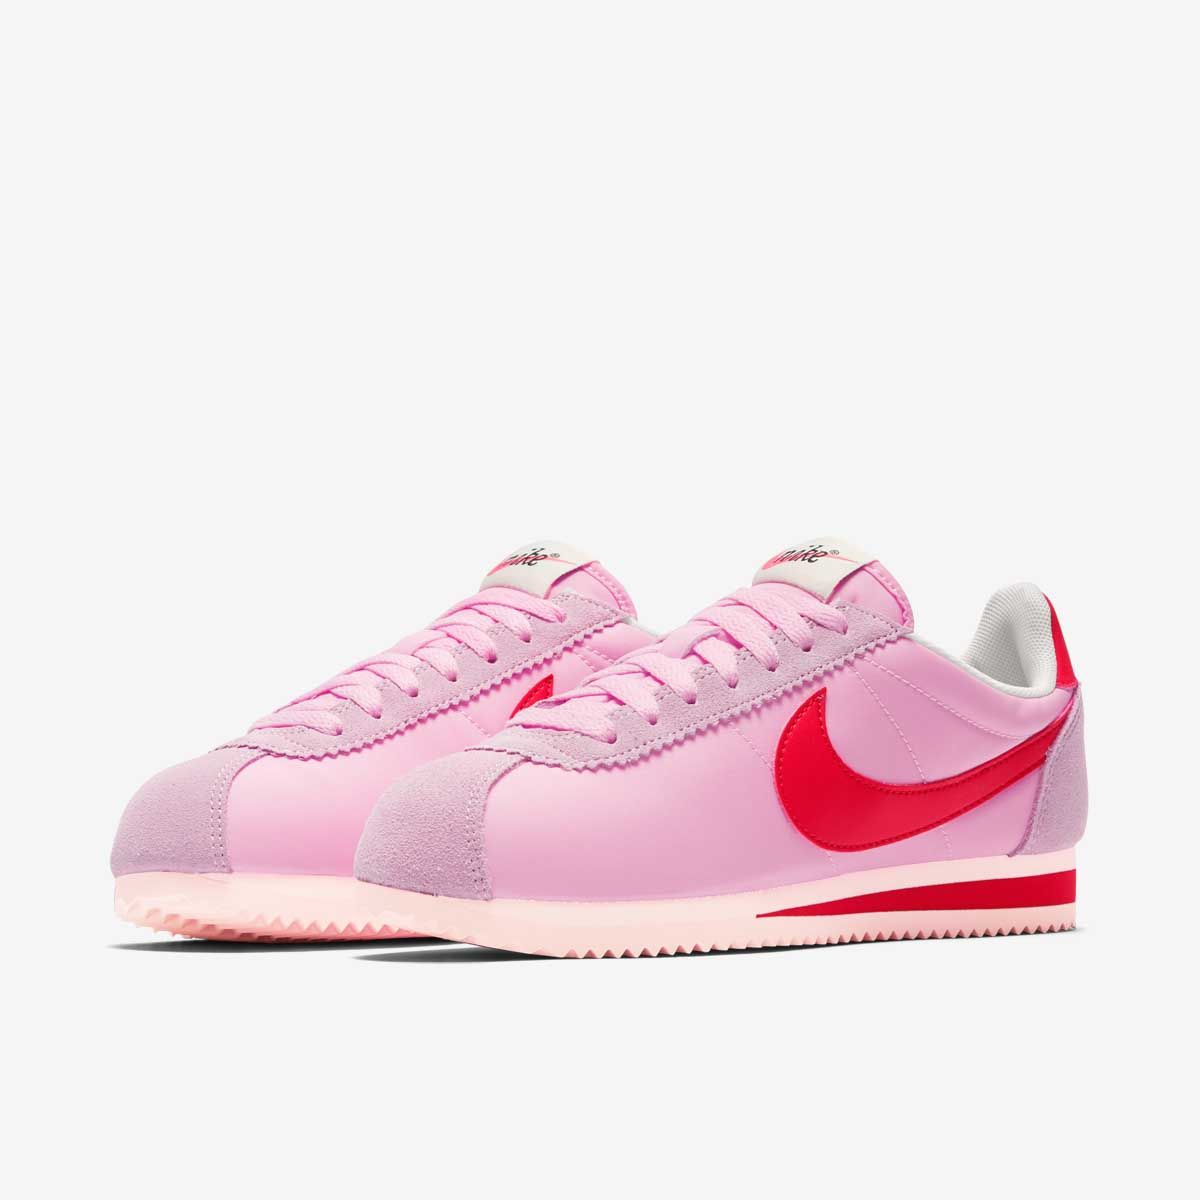 Кроссовки Nike WMNS CLASSIC CORTEZ NYLON PREM